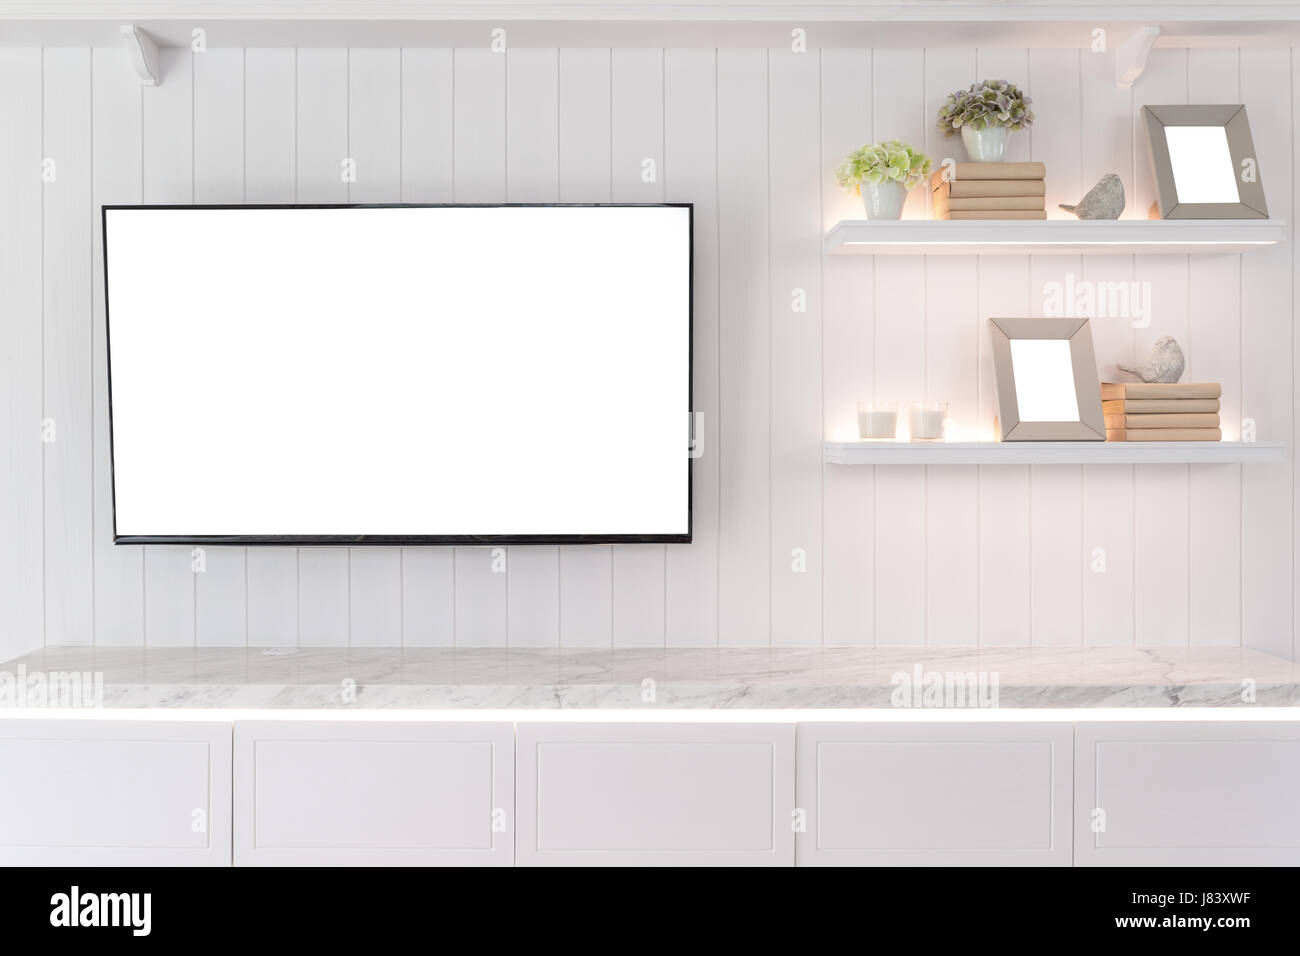 Home Theater System Stockfotos & Home Theater System Bilder - Seite ...